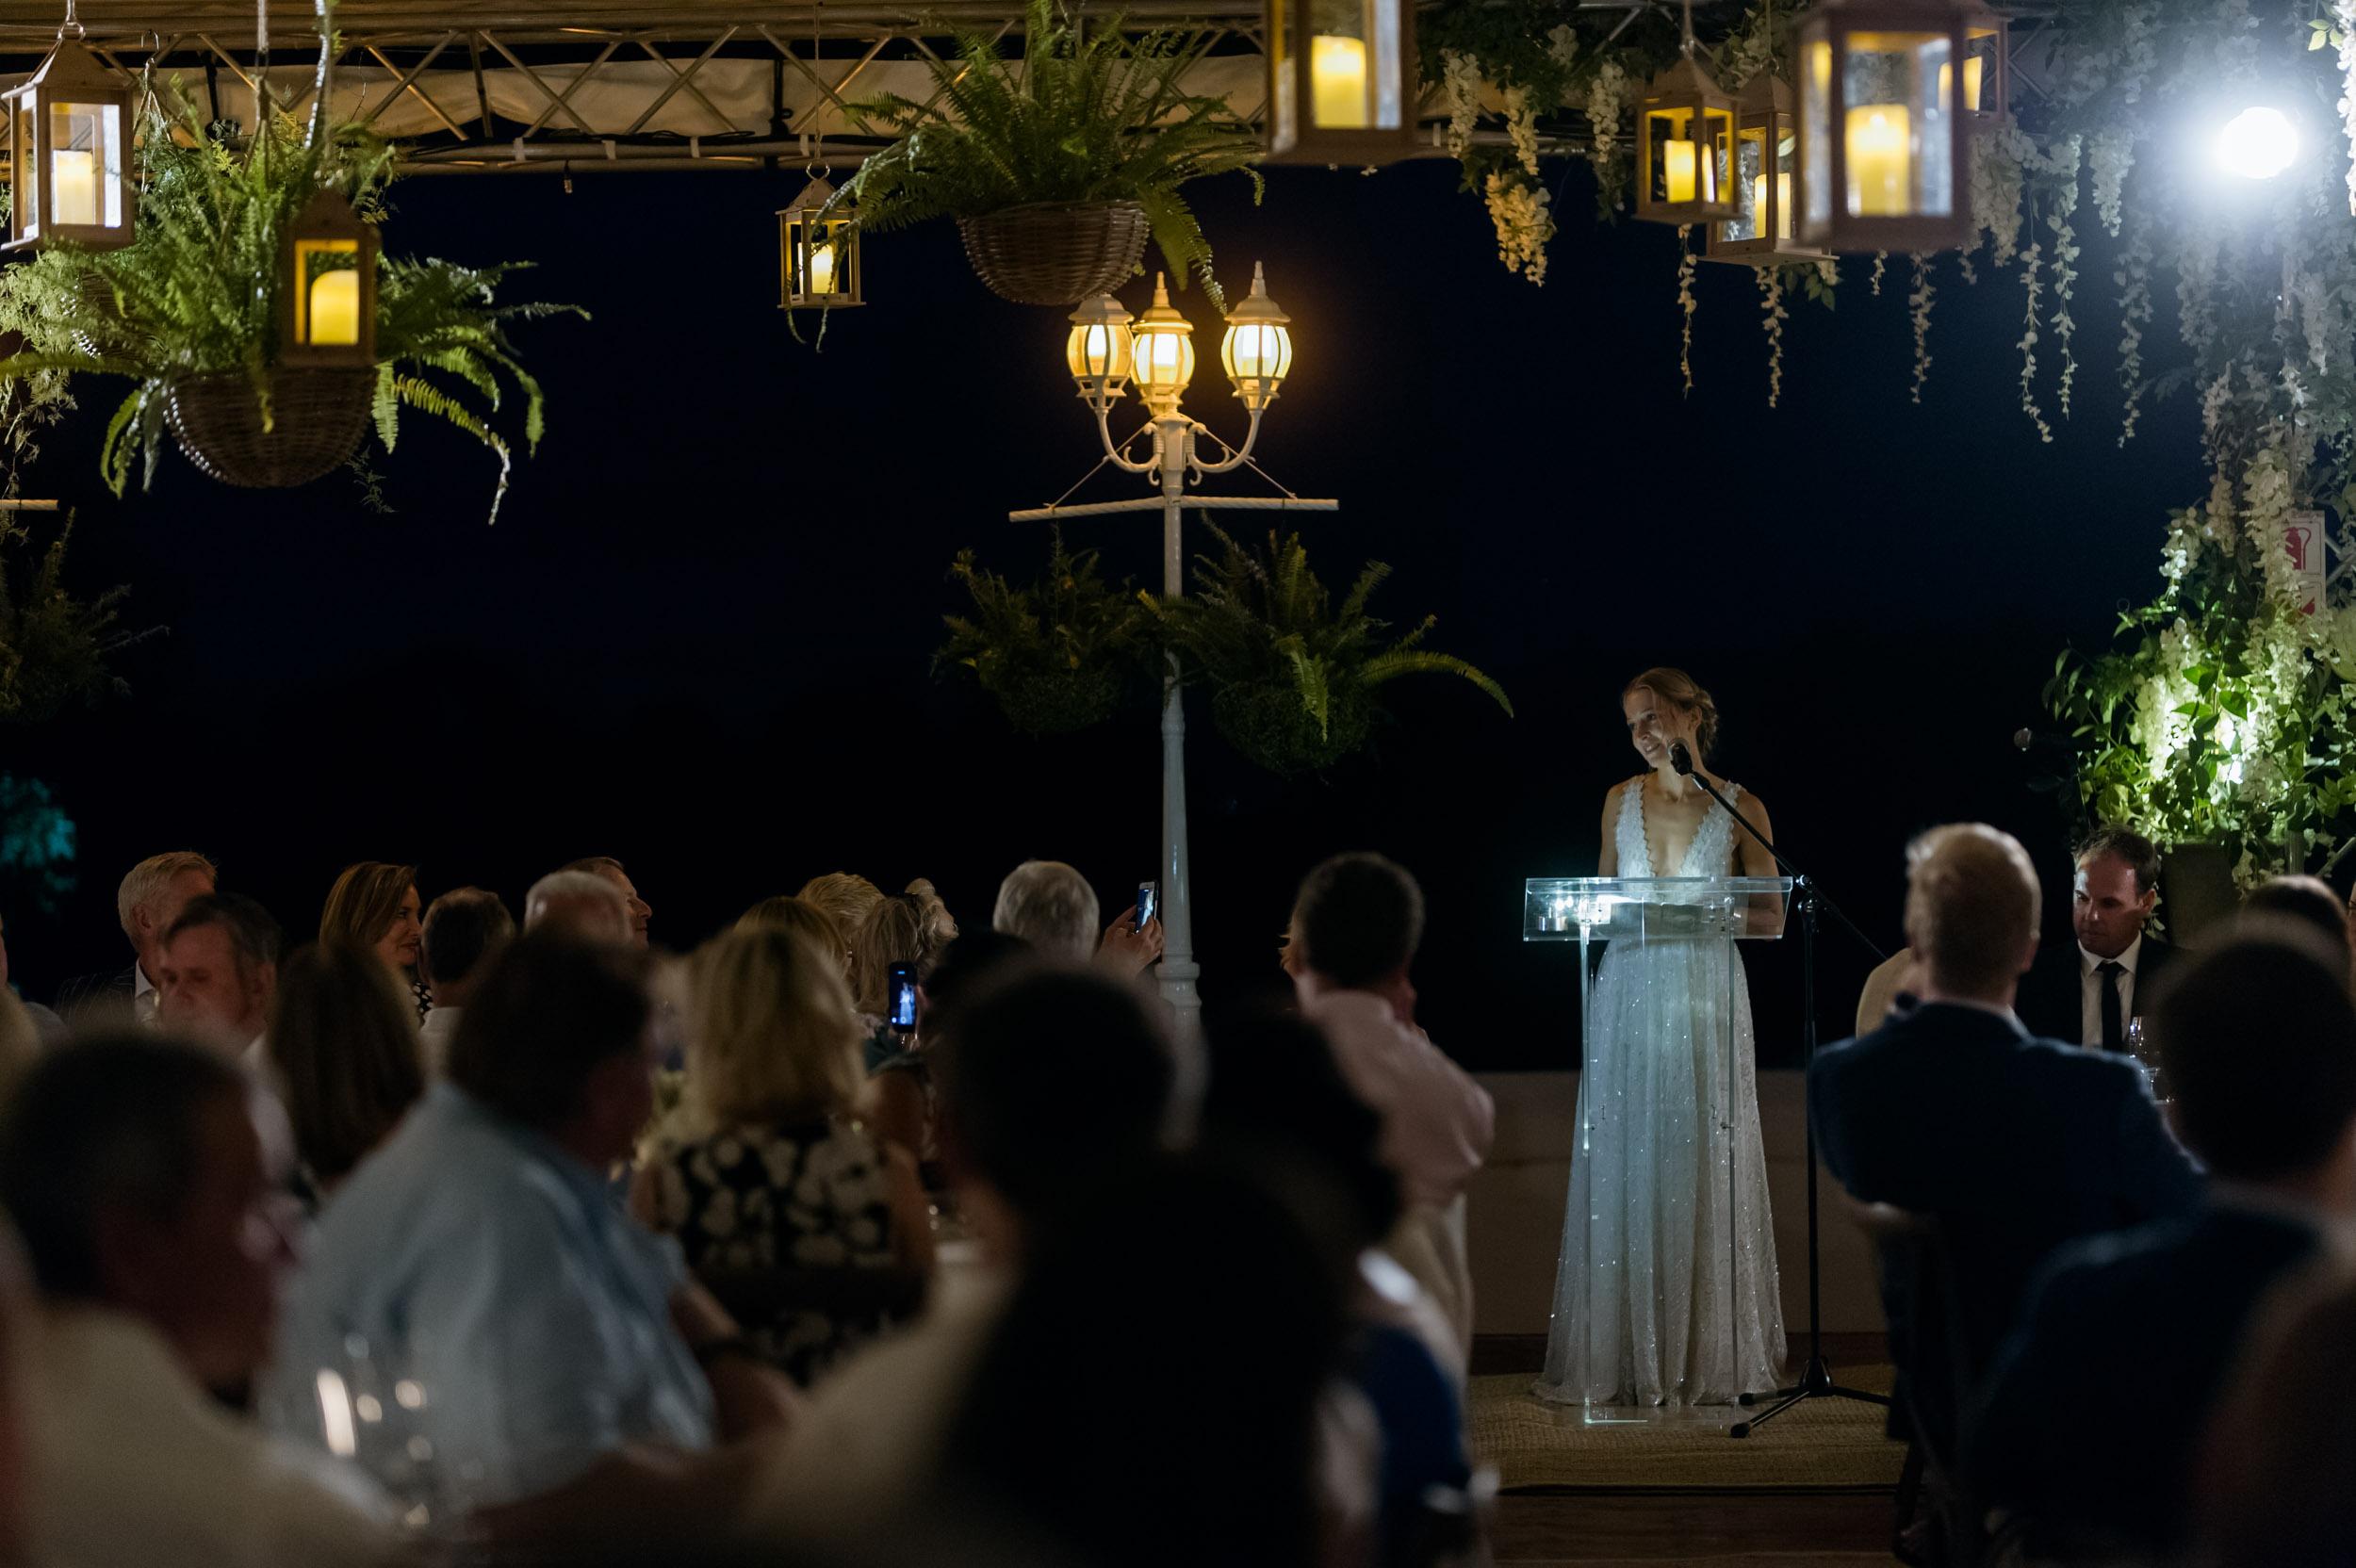 cape-town-south-africa-wedding-photographer-john-henry-photo-formalities-001.JPG